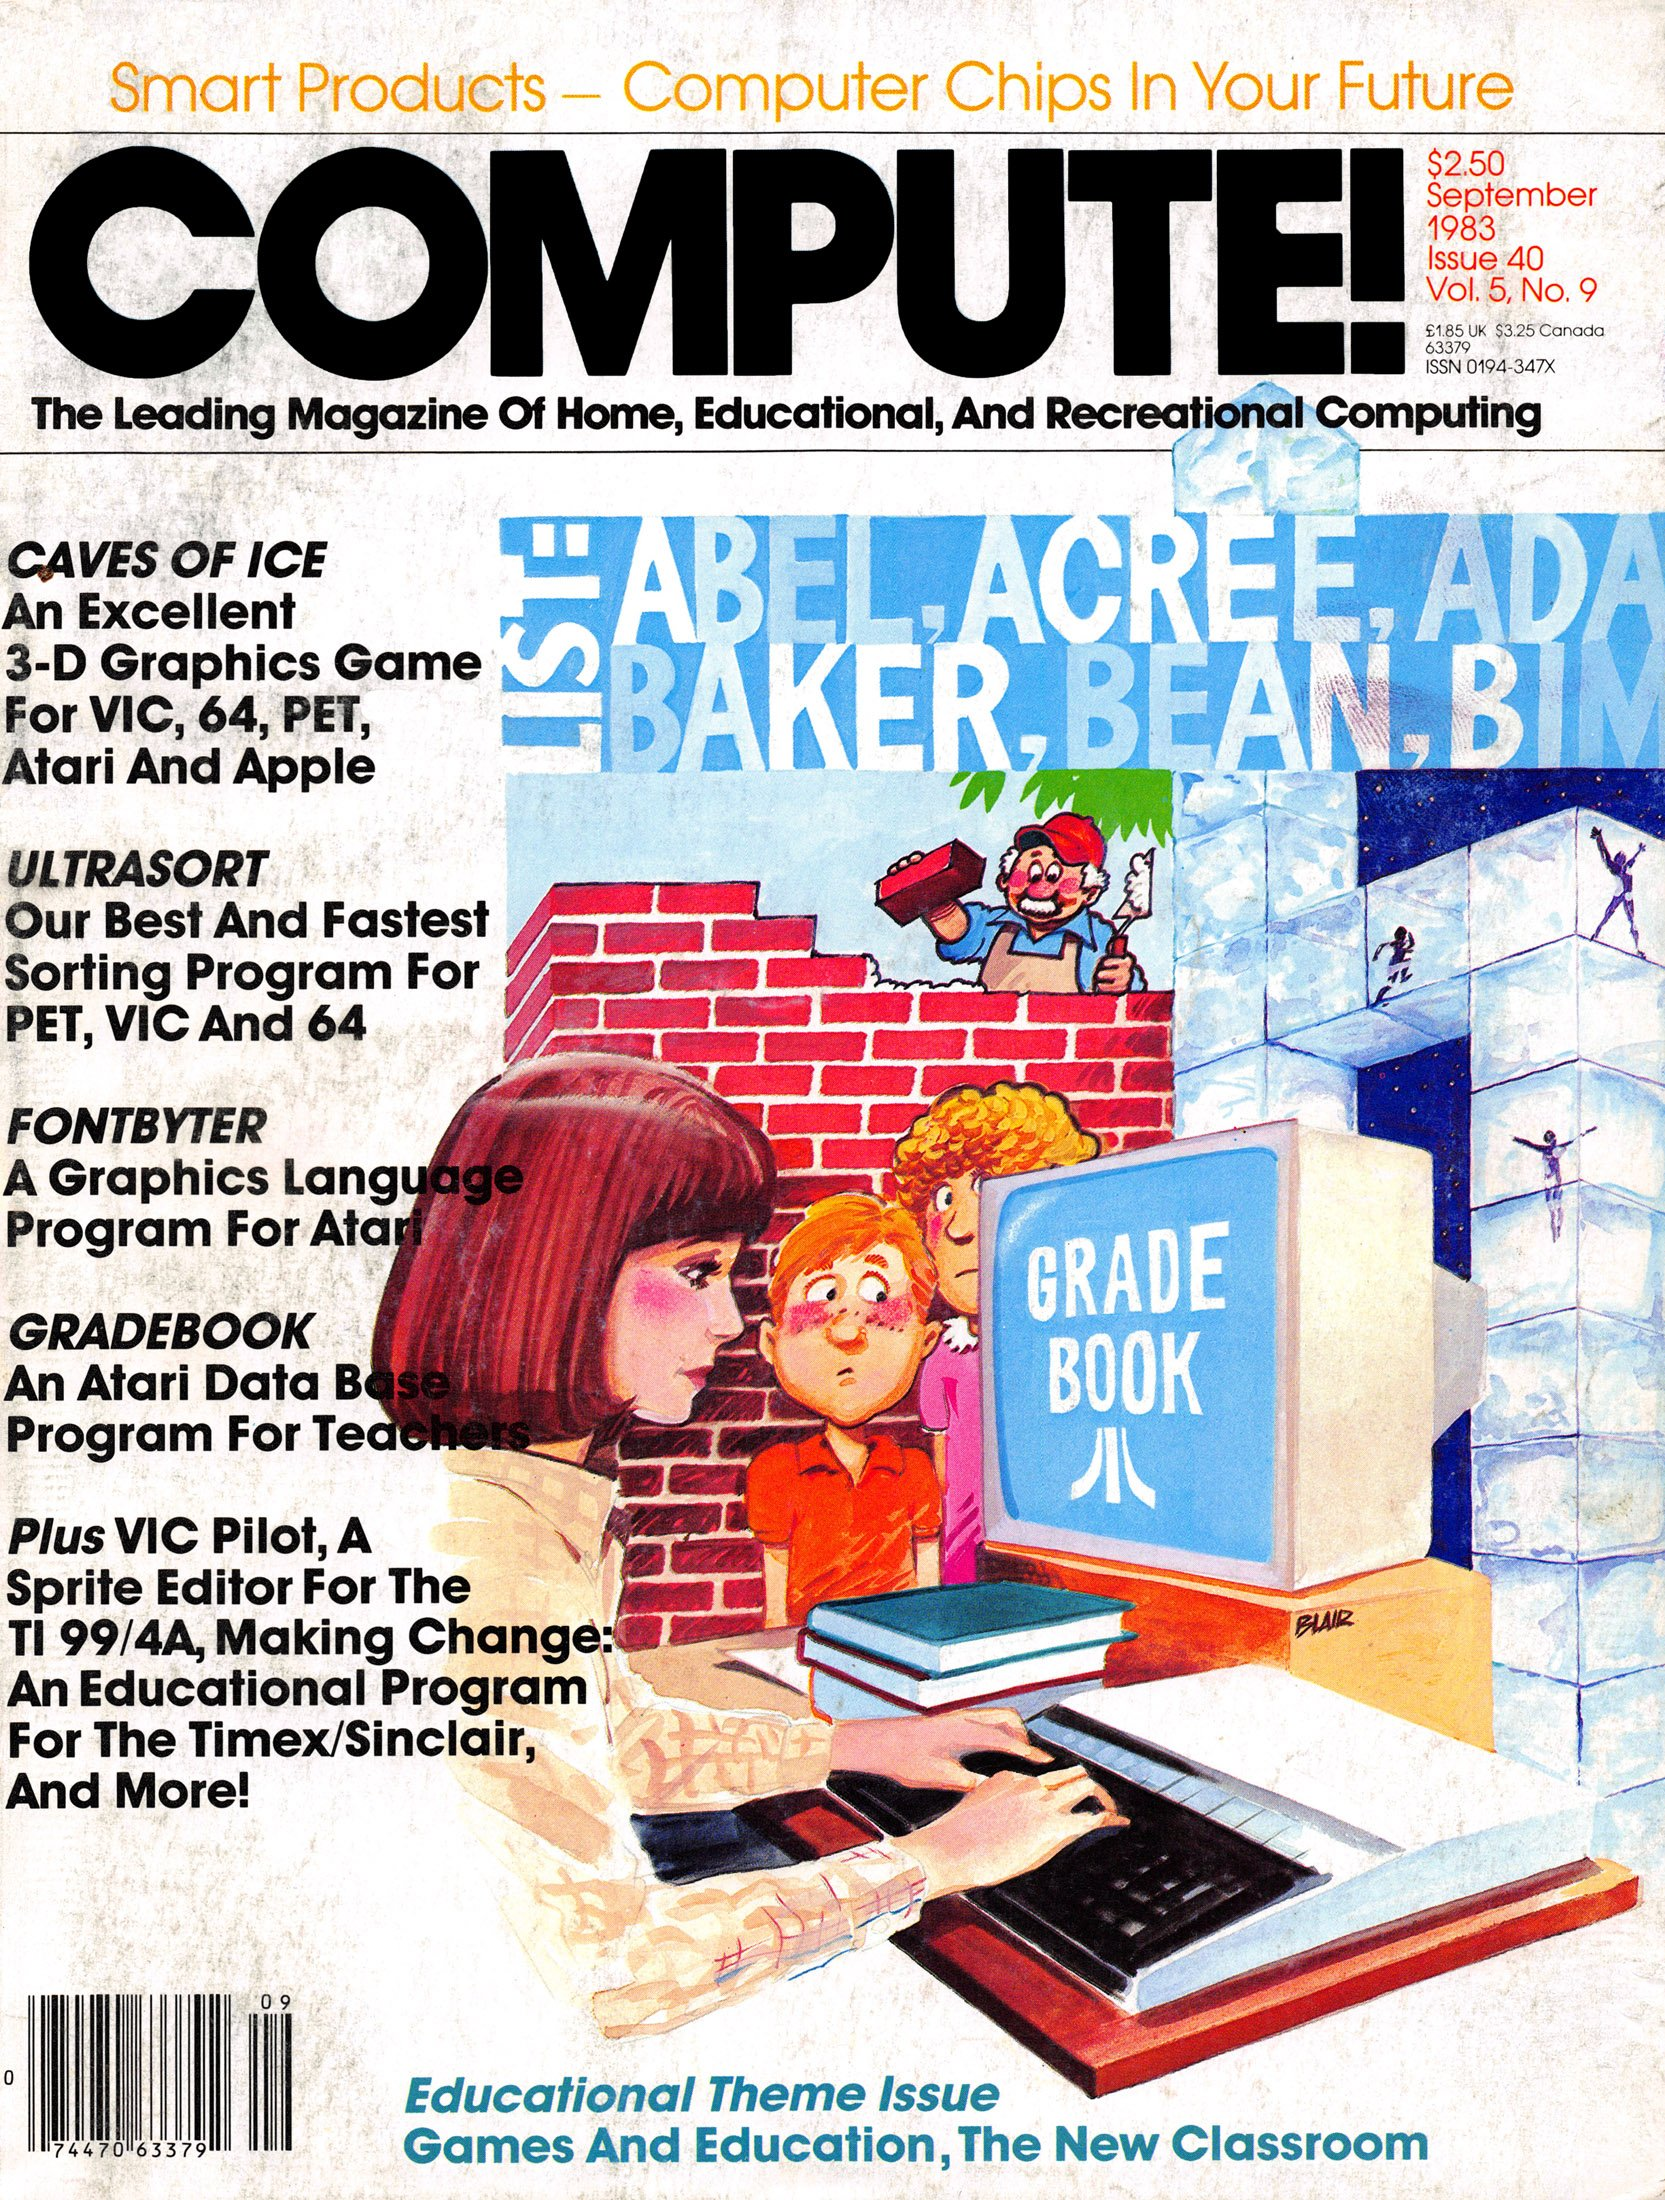 Compute! Issue 040 Vol. 5, No. 9 September 1983